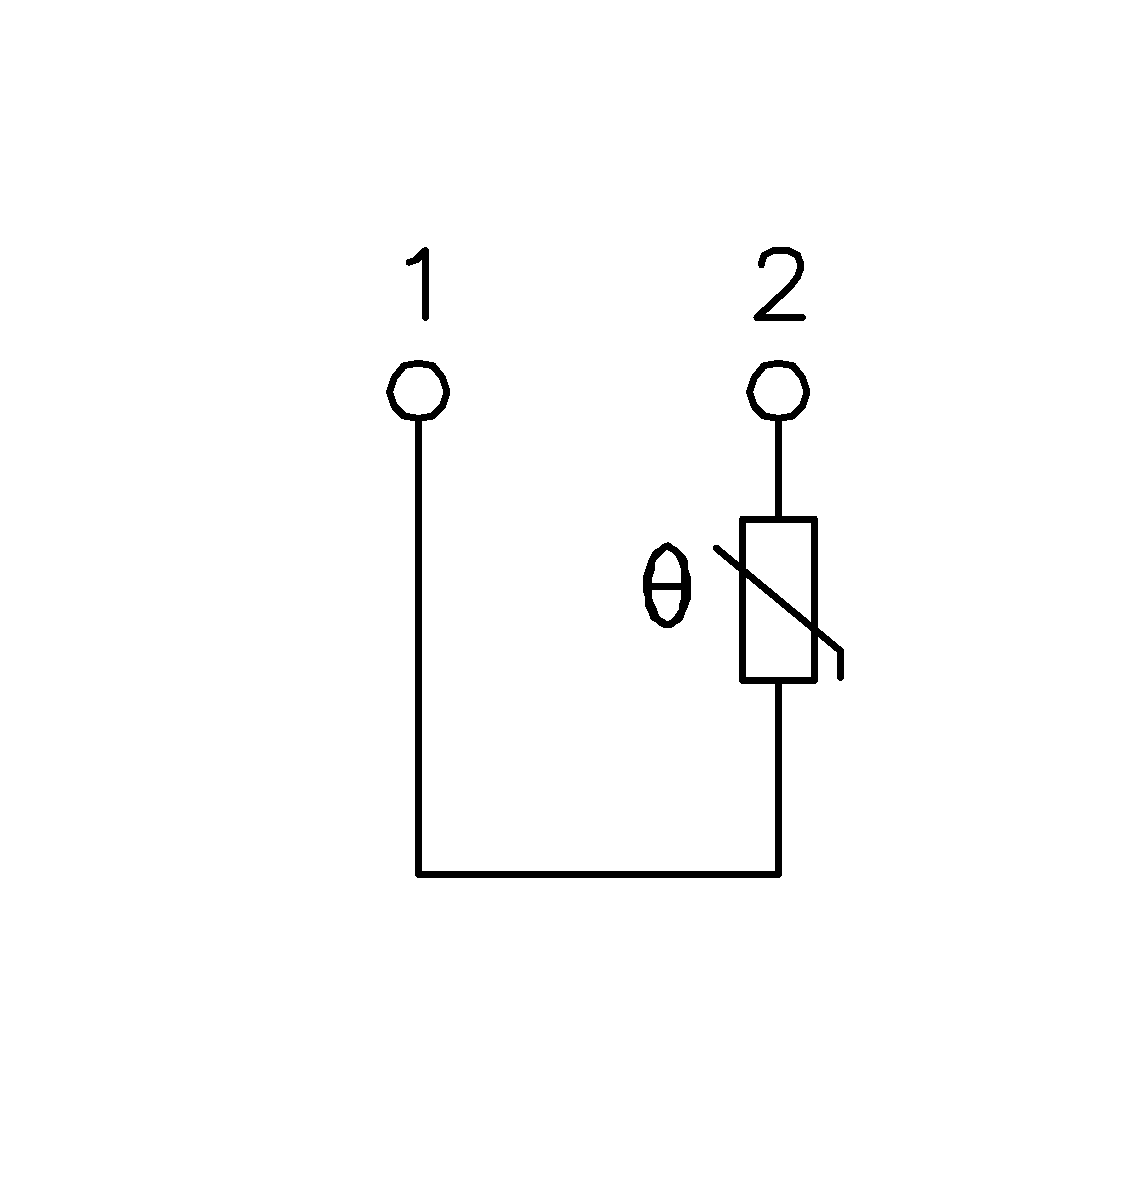 SN090198 Circuit diagram